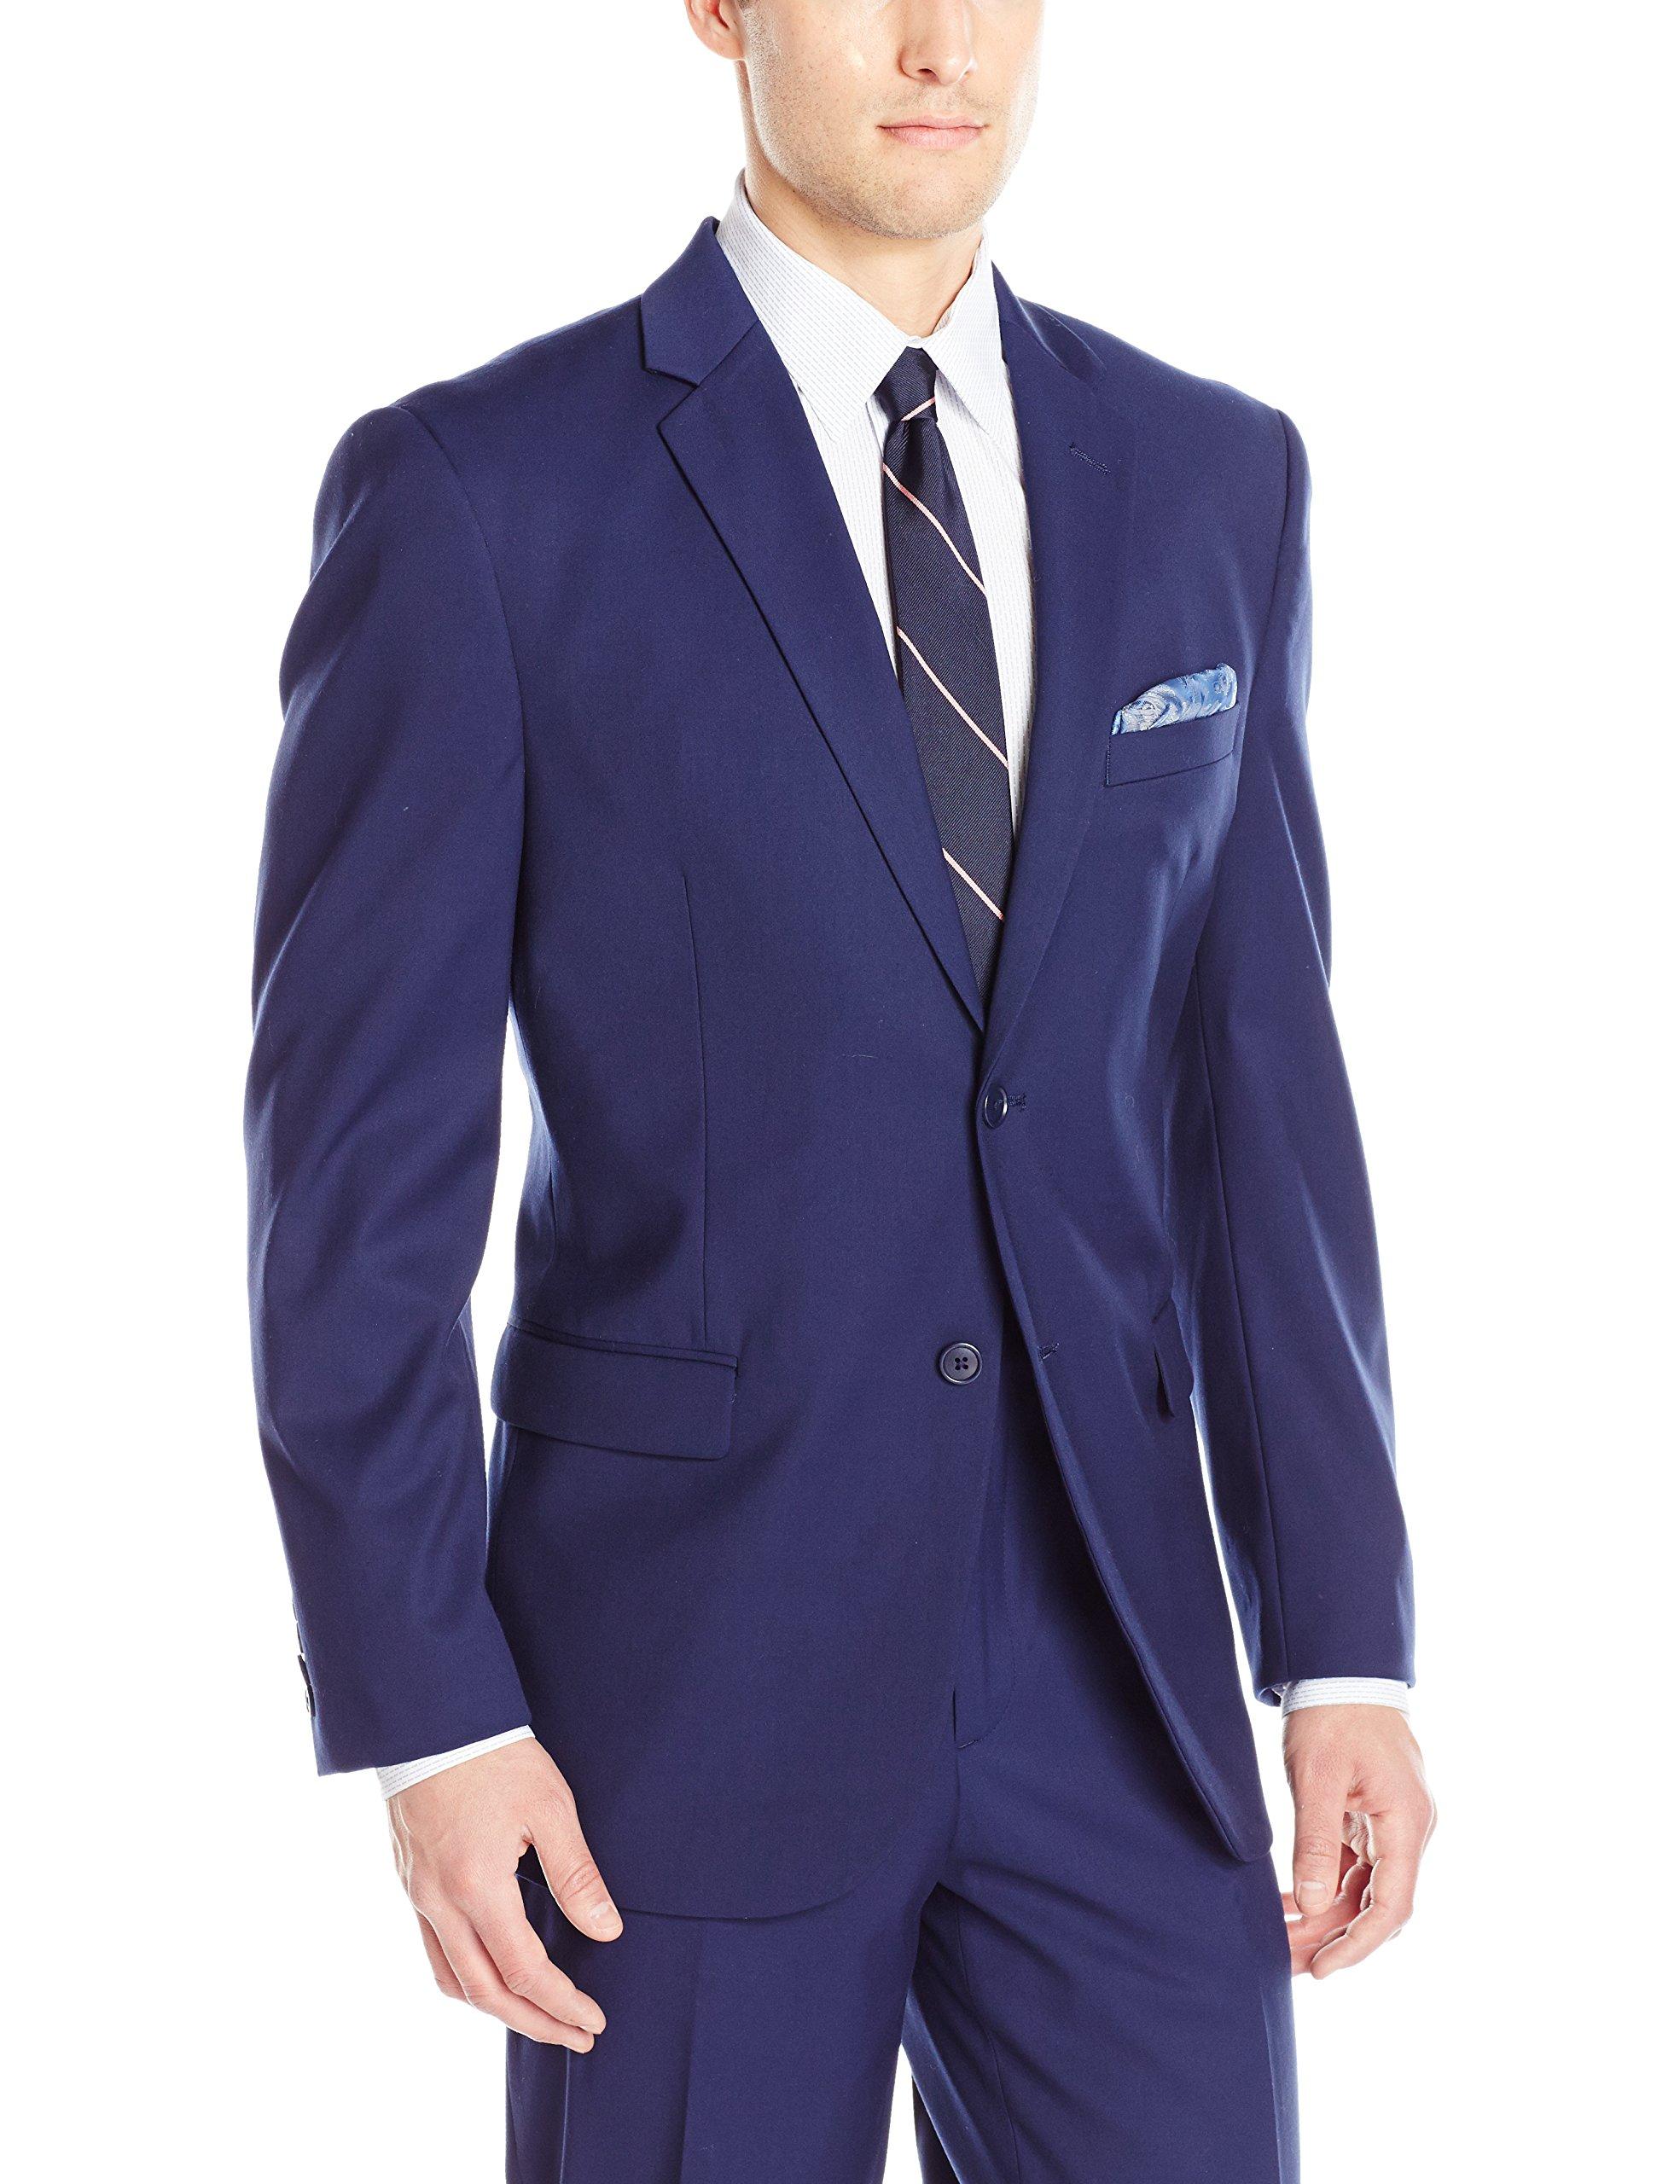 Adolfo Men's Modern Fit Micro Tech Suit Jacket, Blue with Lycra Stretch, 46 Regular